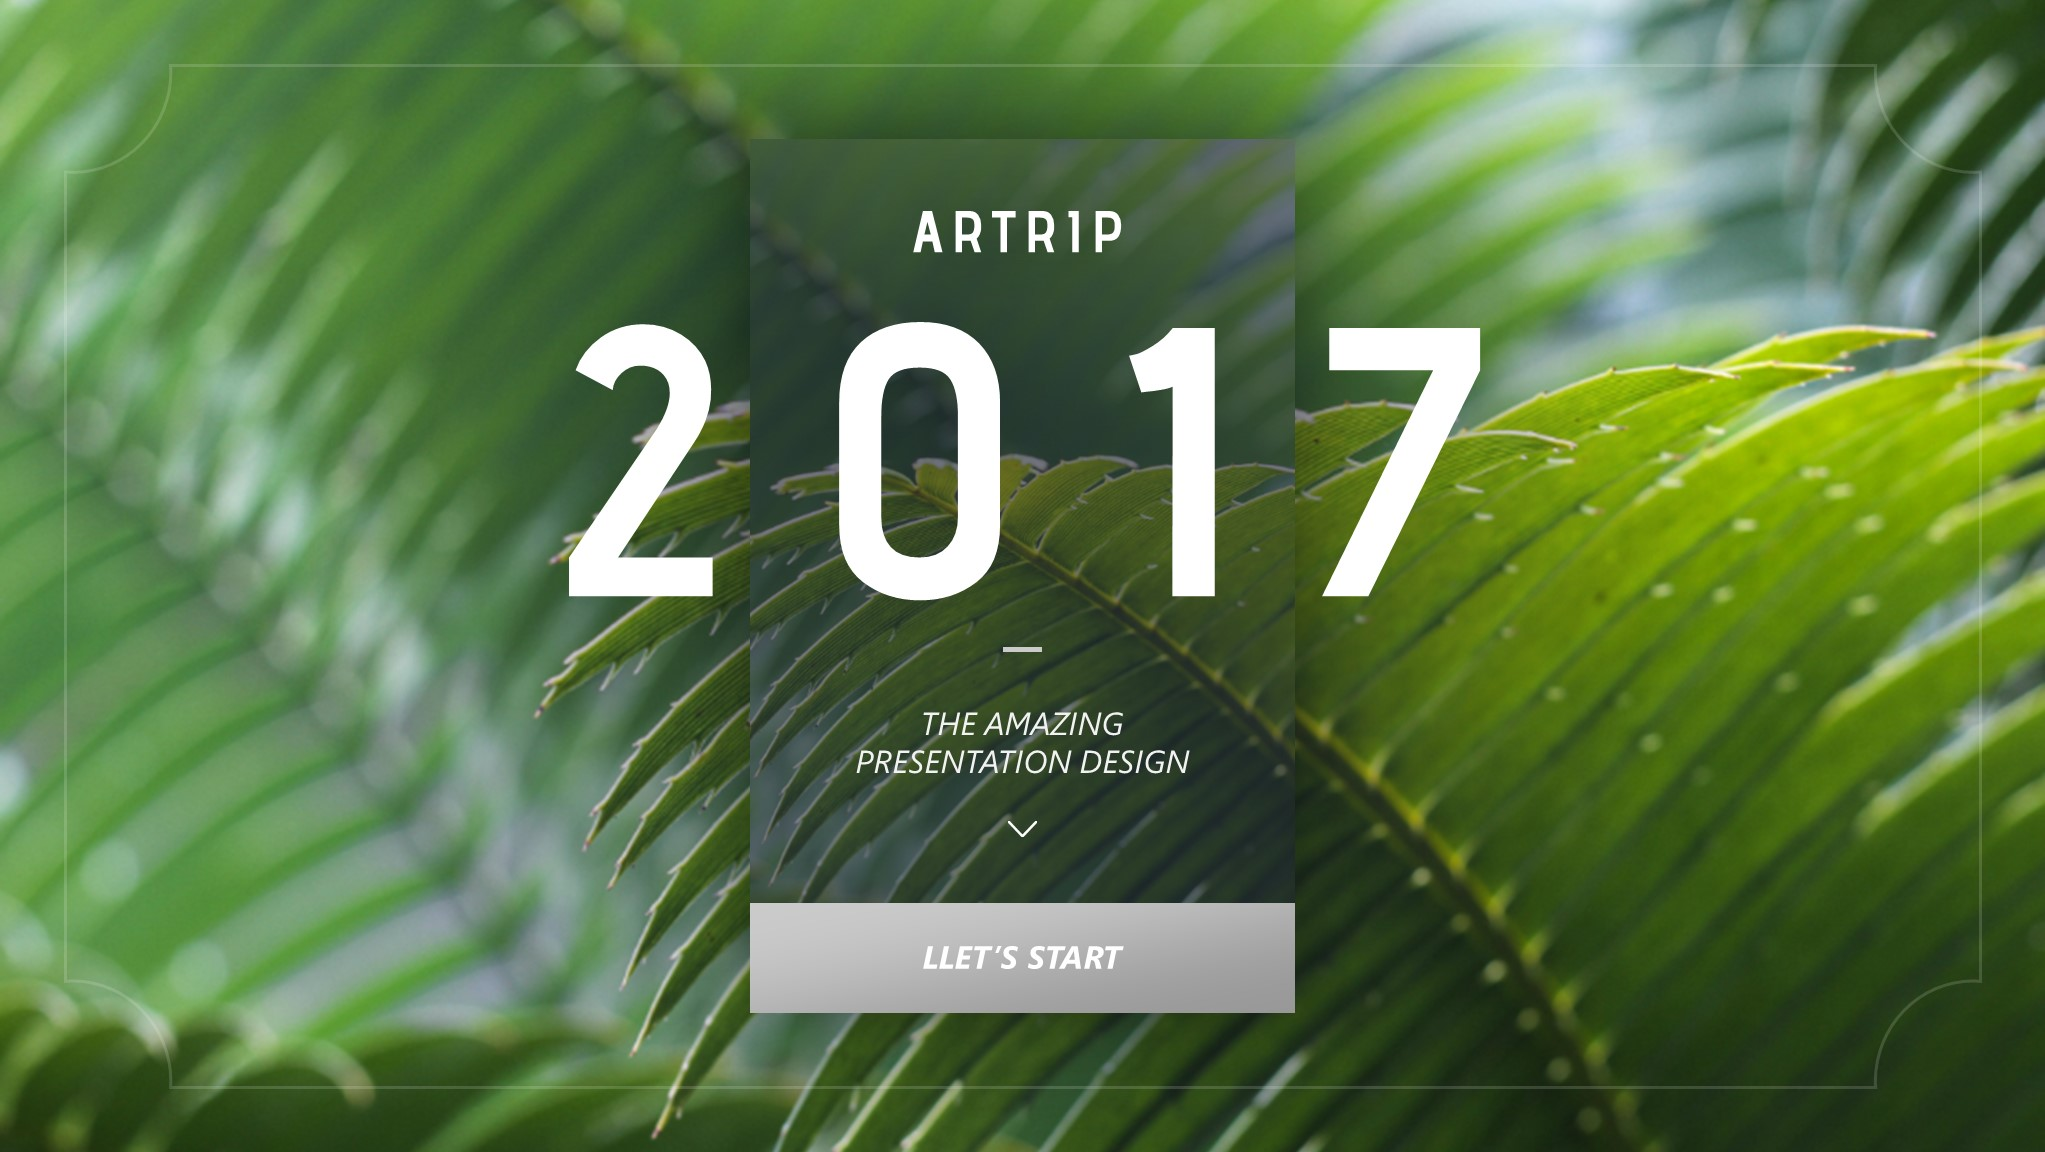 artrip amazing presentation by brandearth graphicriver